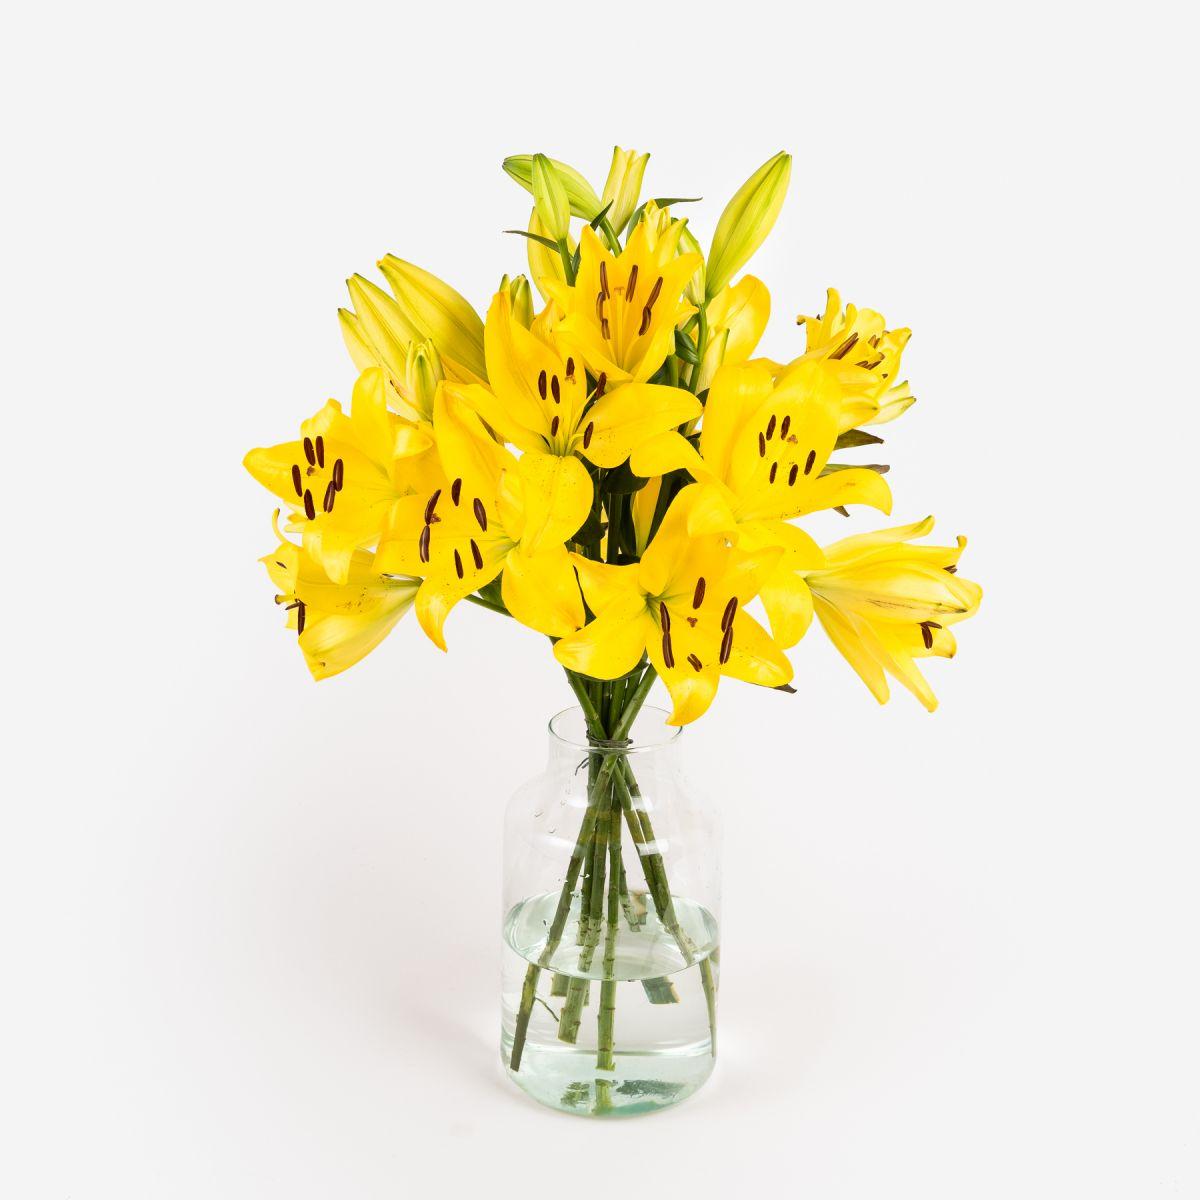 Beau Soleil - Gigli gialli - Fiori a domicilio - Colvin